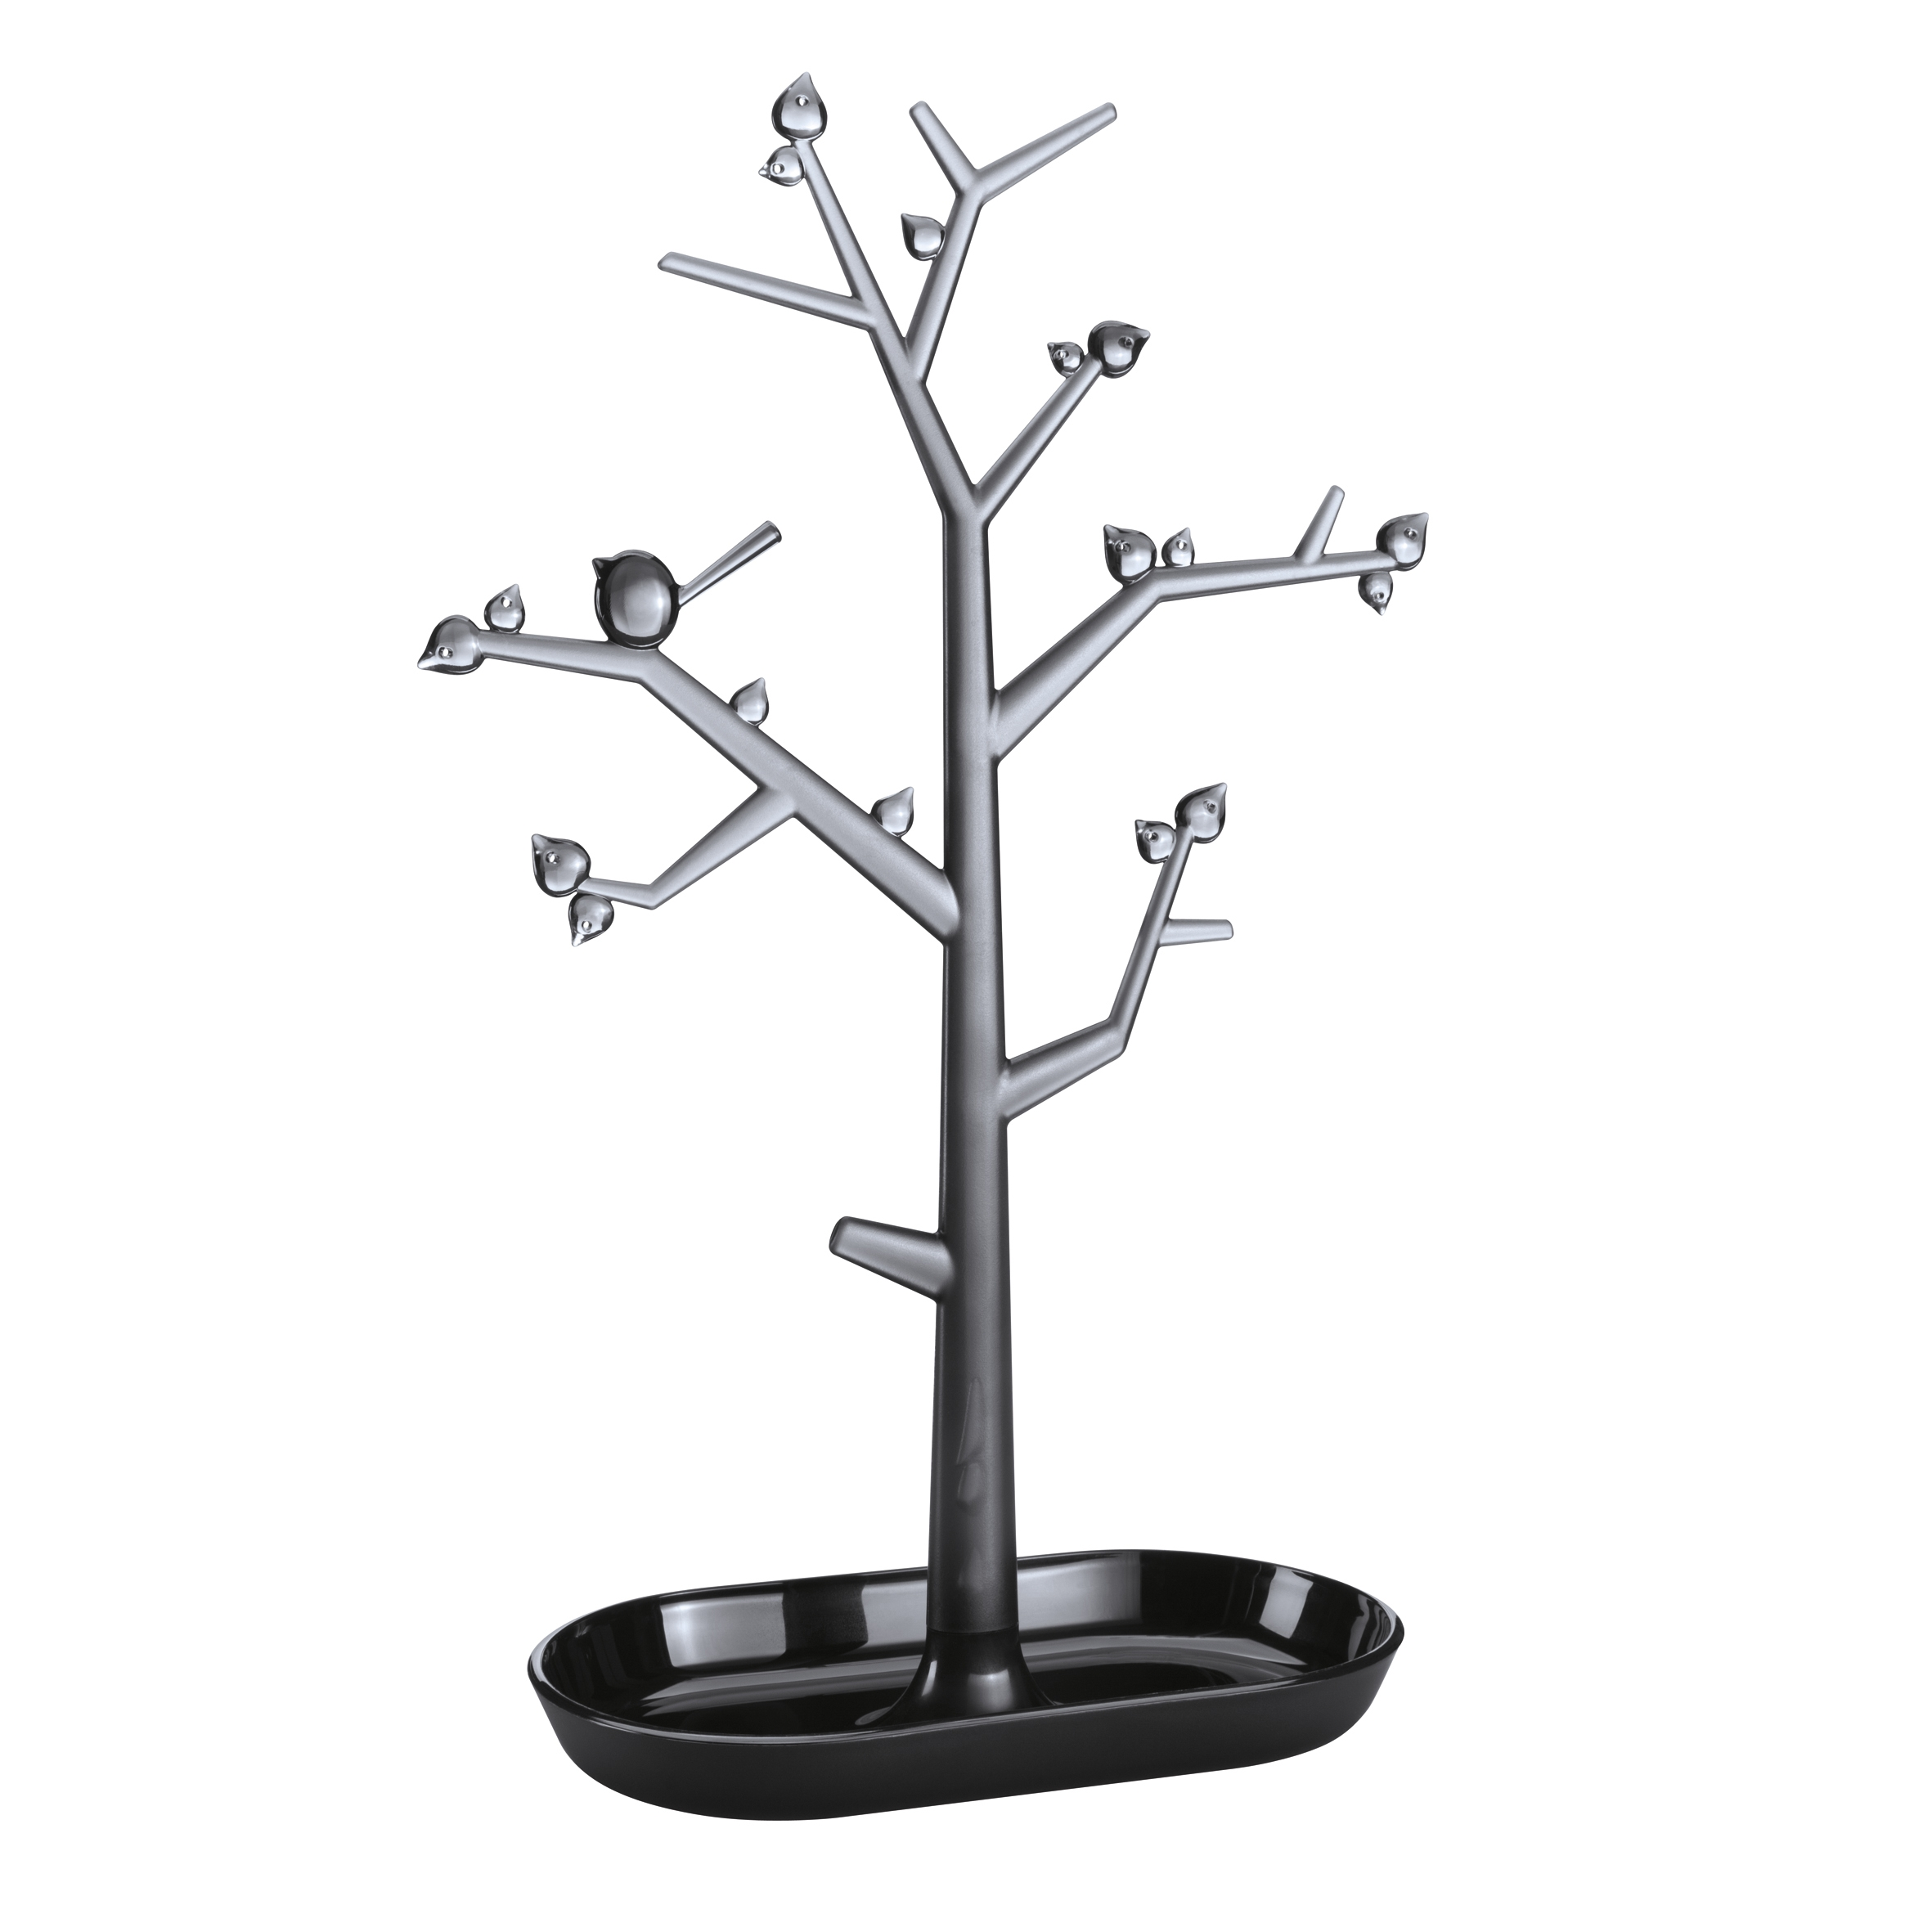 Suport pentru bijuterii din termoplastic Trinket Tree II Negru, l27,6xA12,8xH43,8 cm imagine